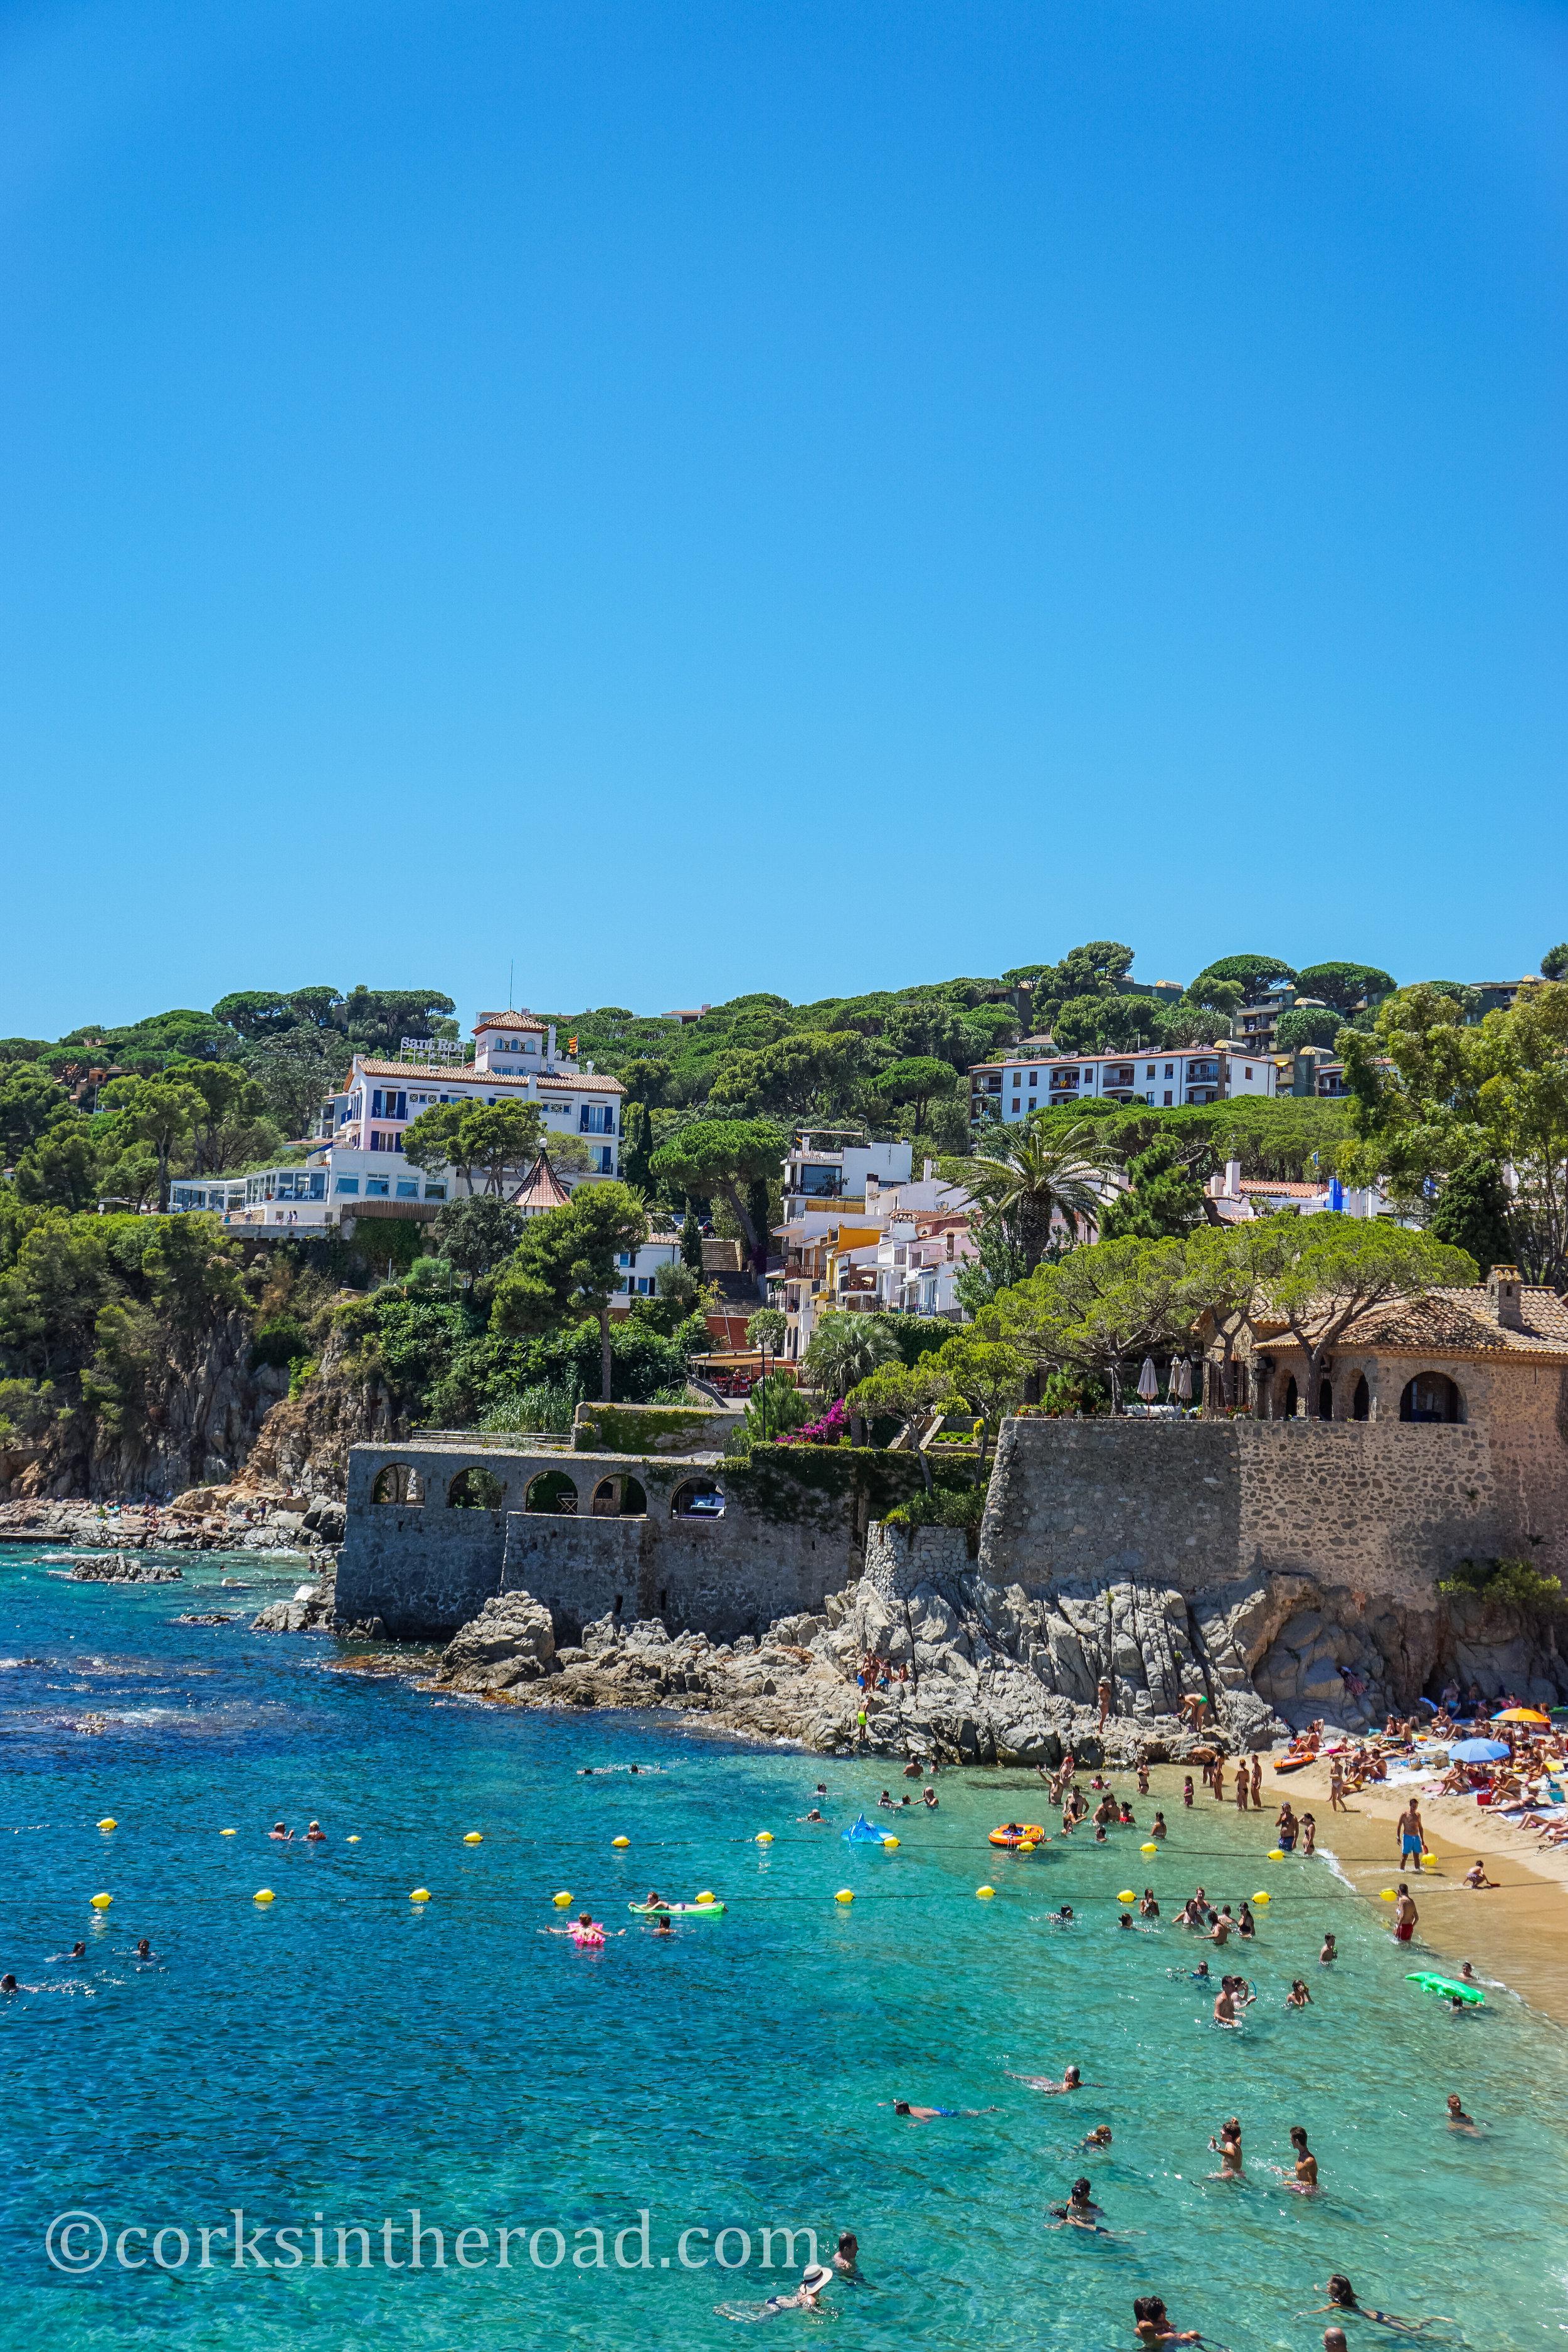 20160807Barcelona, Beaches, Corksintheroad, Costa Brava, Costa Brava Landscape-6.jpg